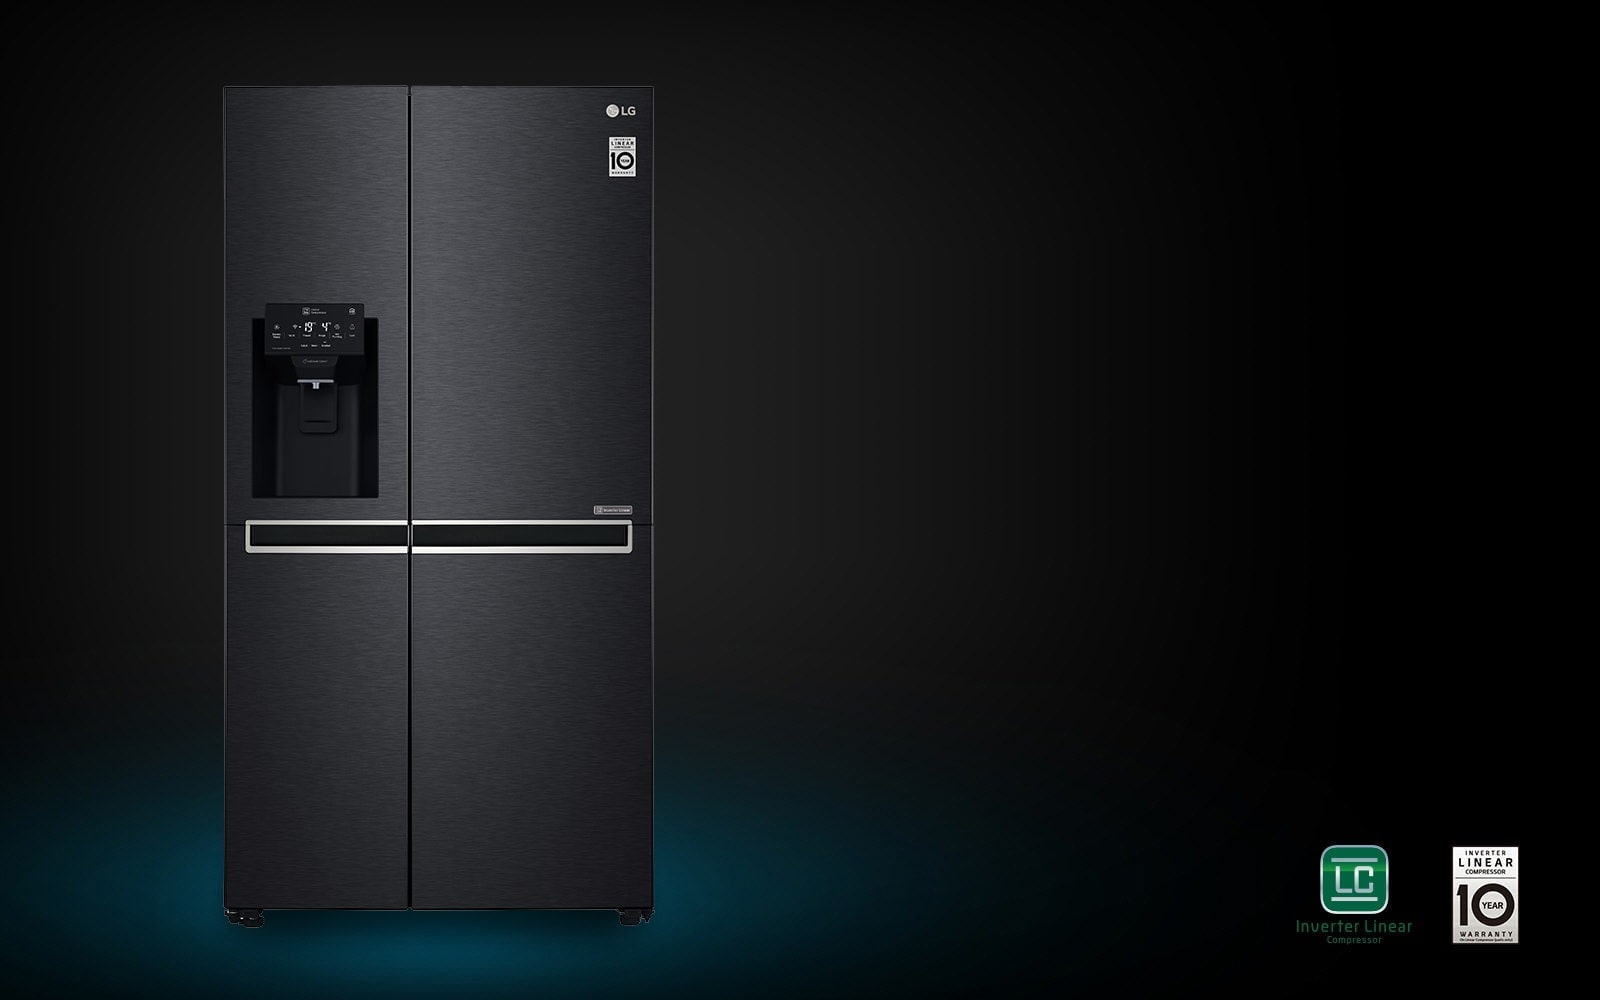 LG GC-J247SQXV 601L 10 Year Parts Warranty On Linear Compressor